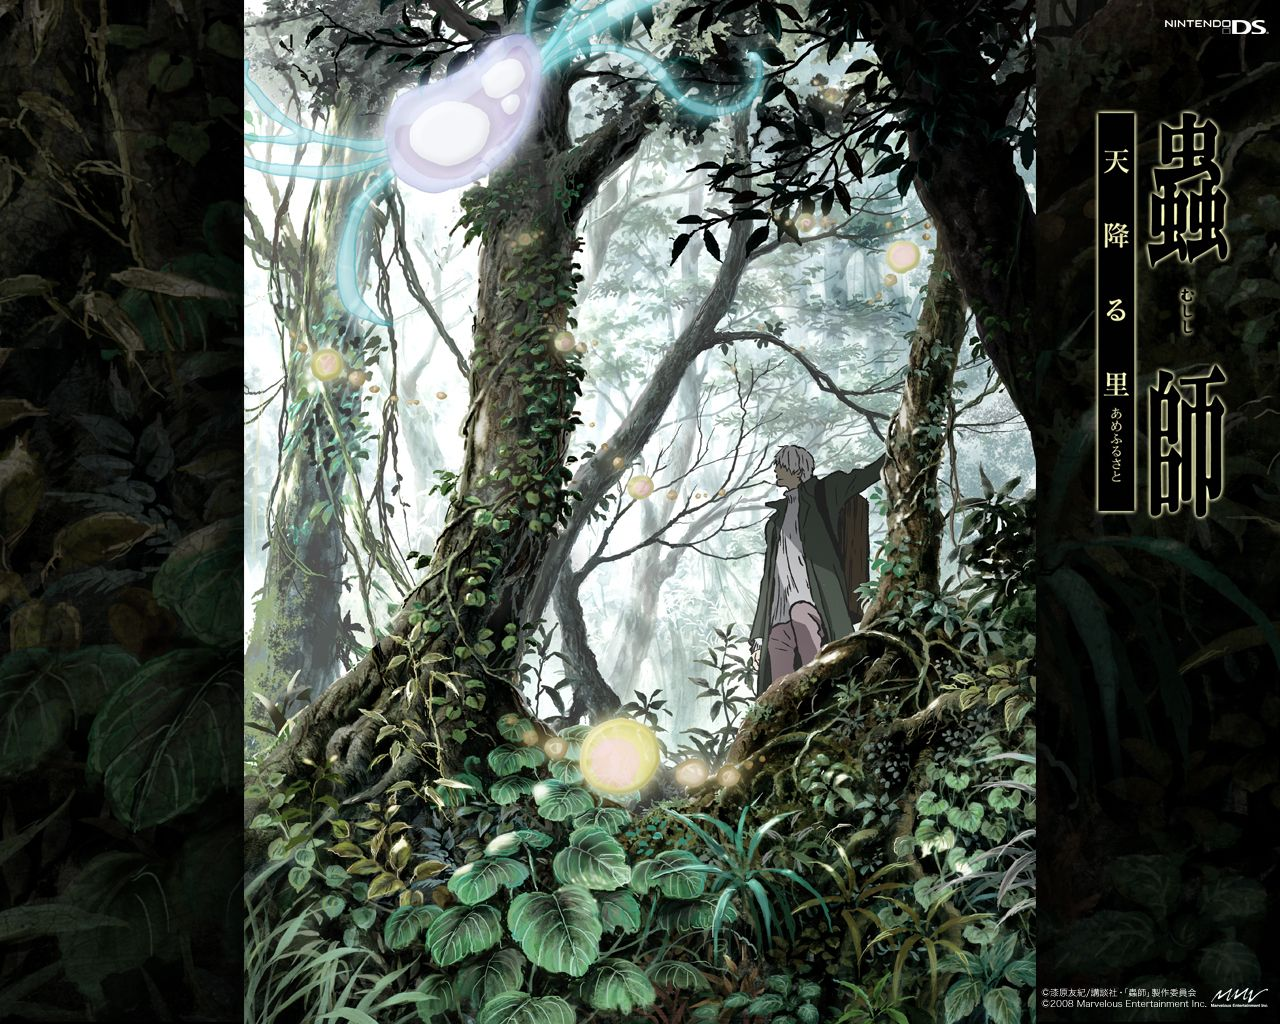 Mushishi-jeu_DS-wallpaper.jpg